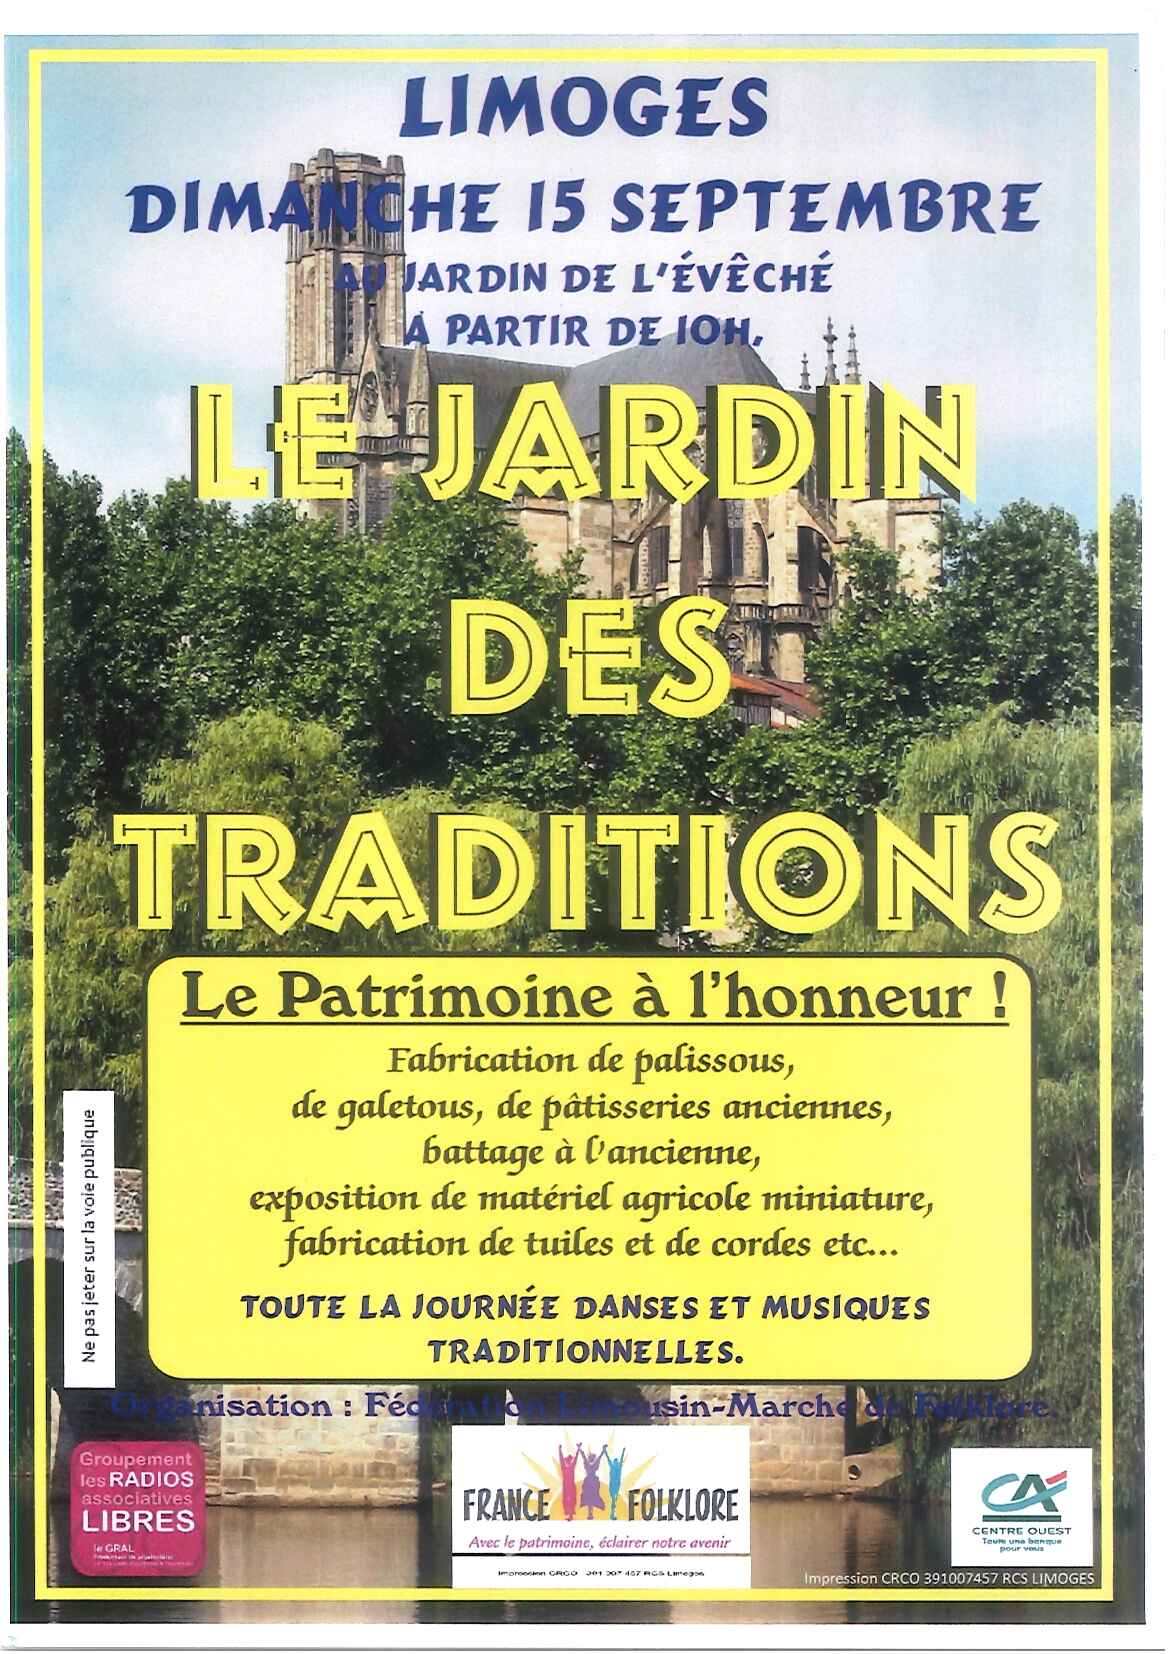 Limoges : Le jardin des traditions